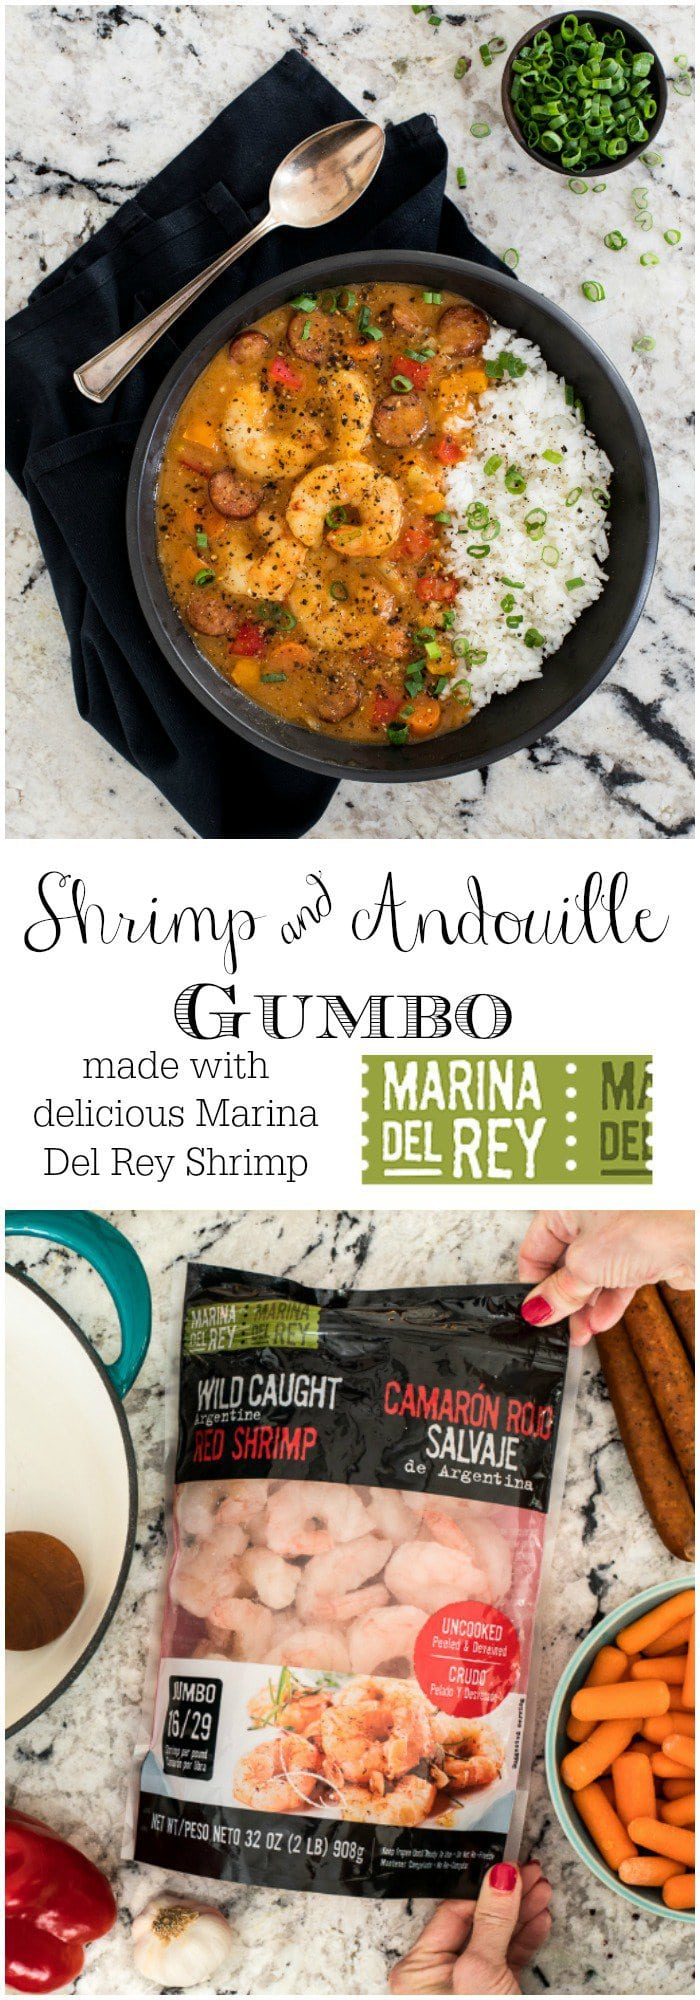 Perfect for entertaining, this Shrimp and Andouille Gumbo is loaded with succulent shrimp, spicy sausage and lots of fresh veggies! #shrimpandandouillegumbo #gumborecipe